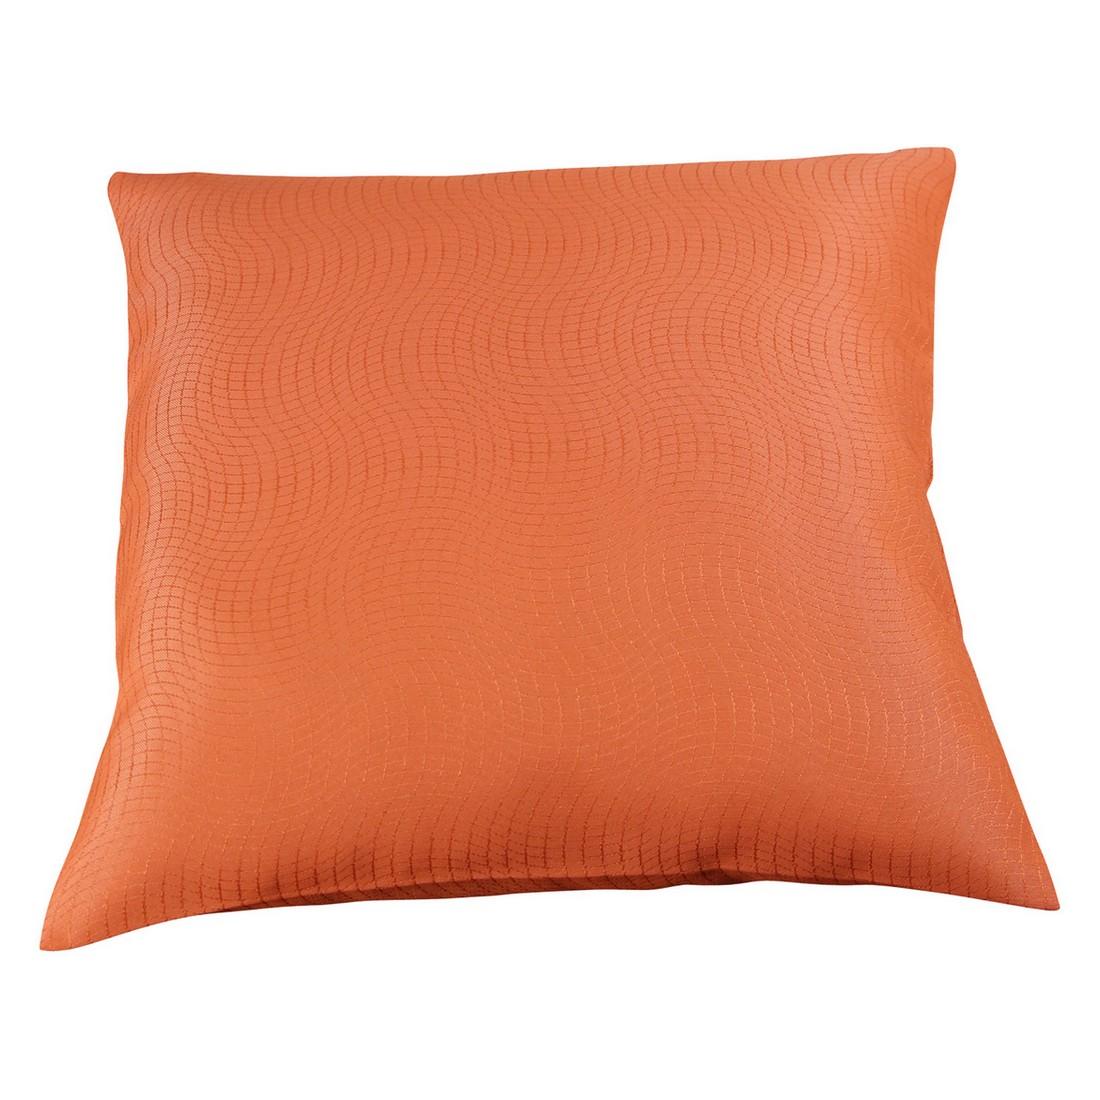 Kissenhülle Mosso (2er,4er oder 6er-Set) – Rotbraun – 40 x 40 cm – 4 Kissen, MiBiento Living bestellen